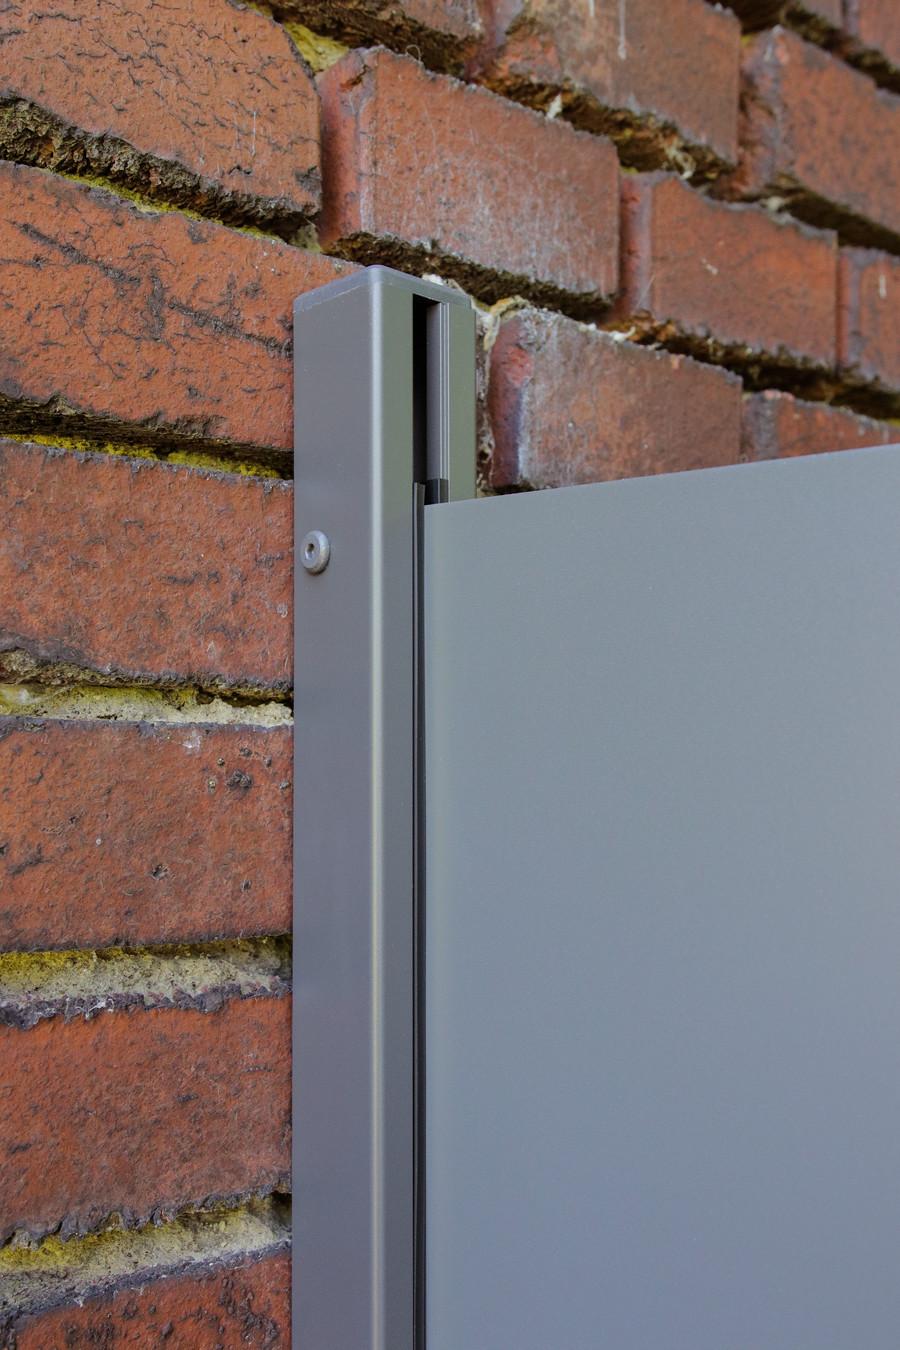 SYSTEM U-Klemmprofil für Wandmontage eines BOARD Zaunfelds